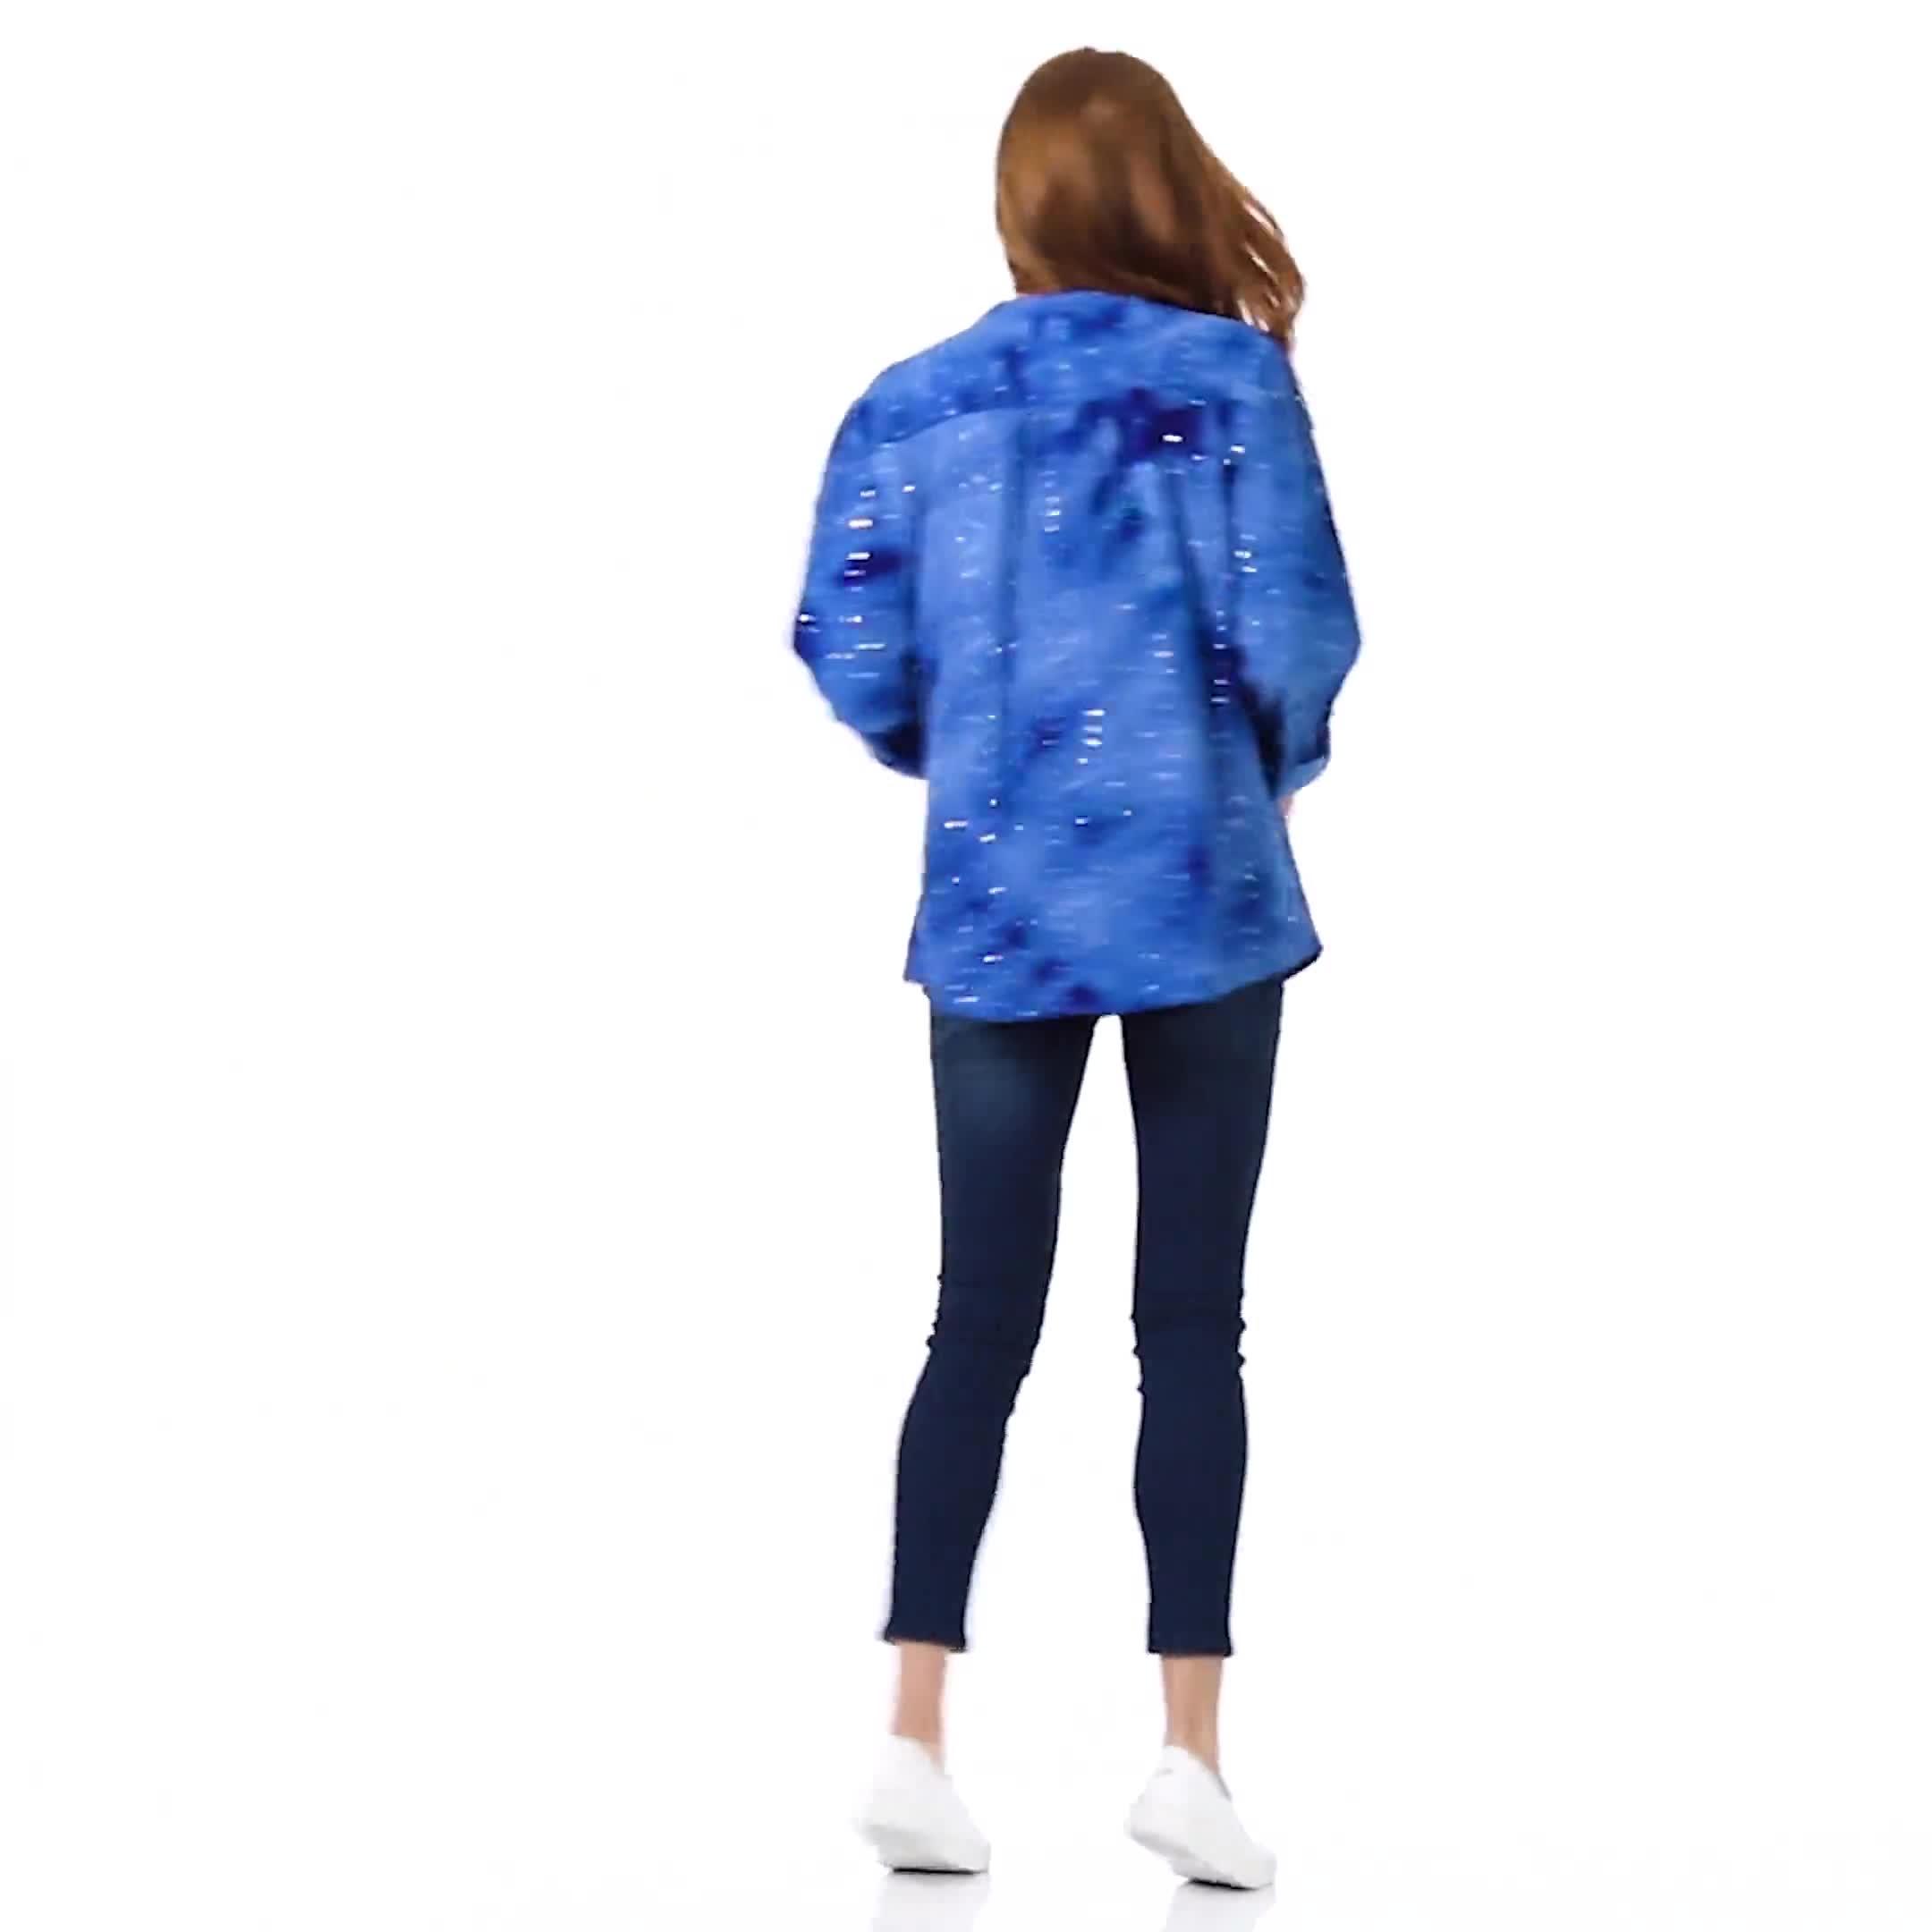 Sequin Blue Tie Dye Popover knit Top - Video